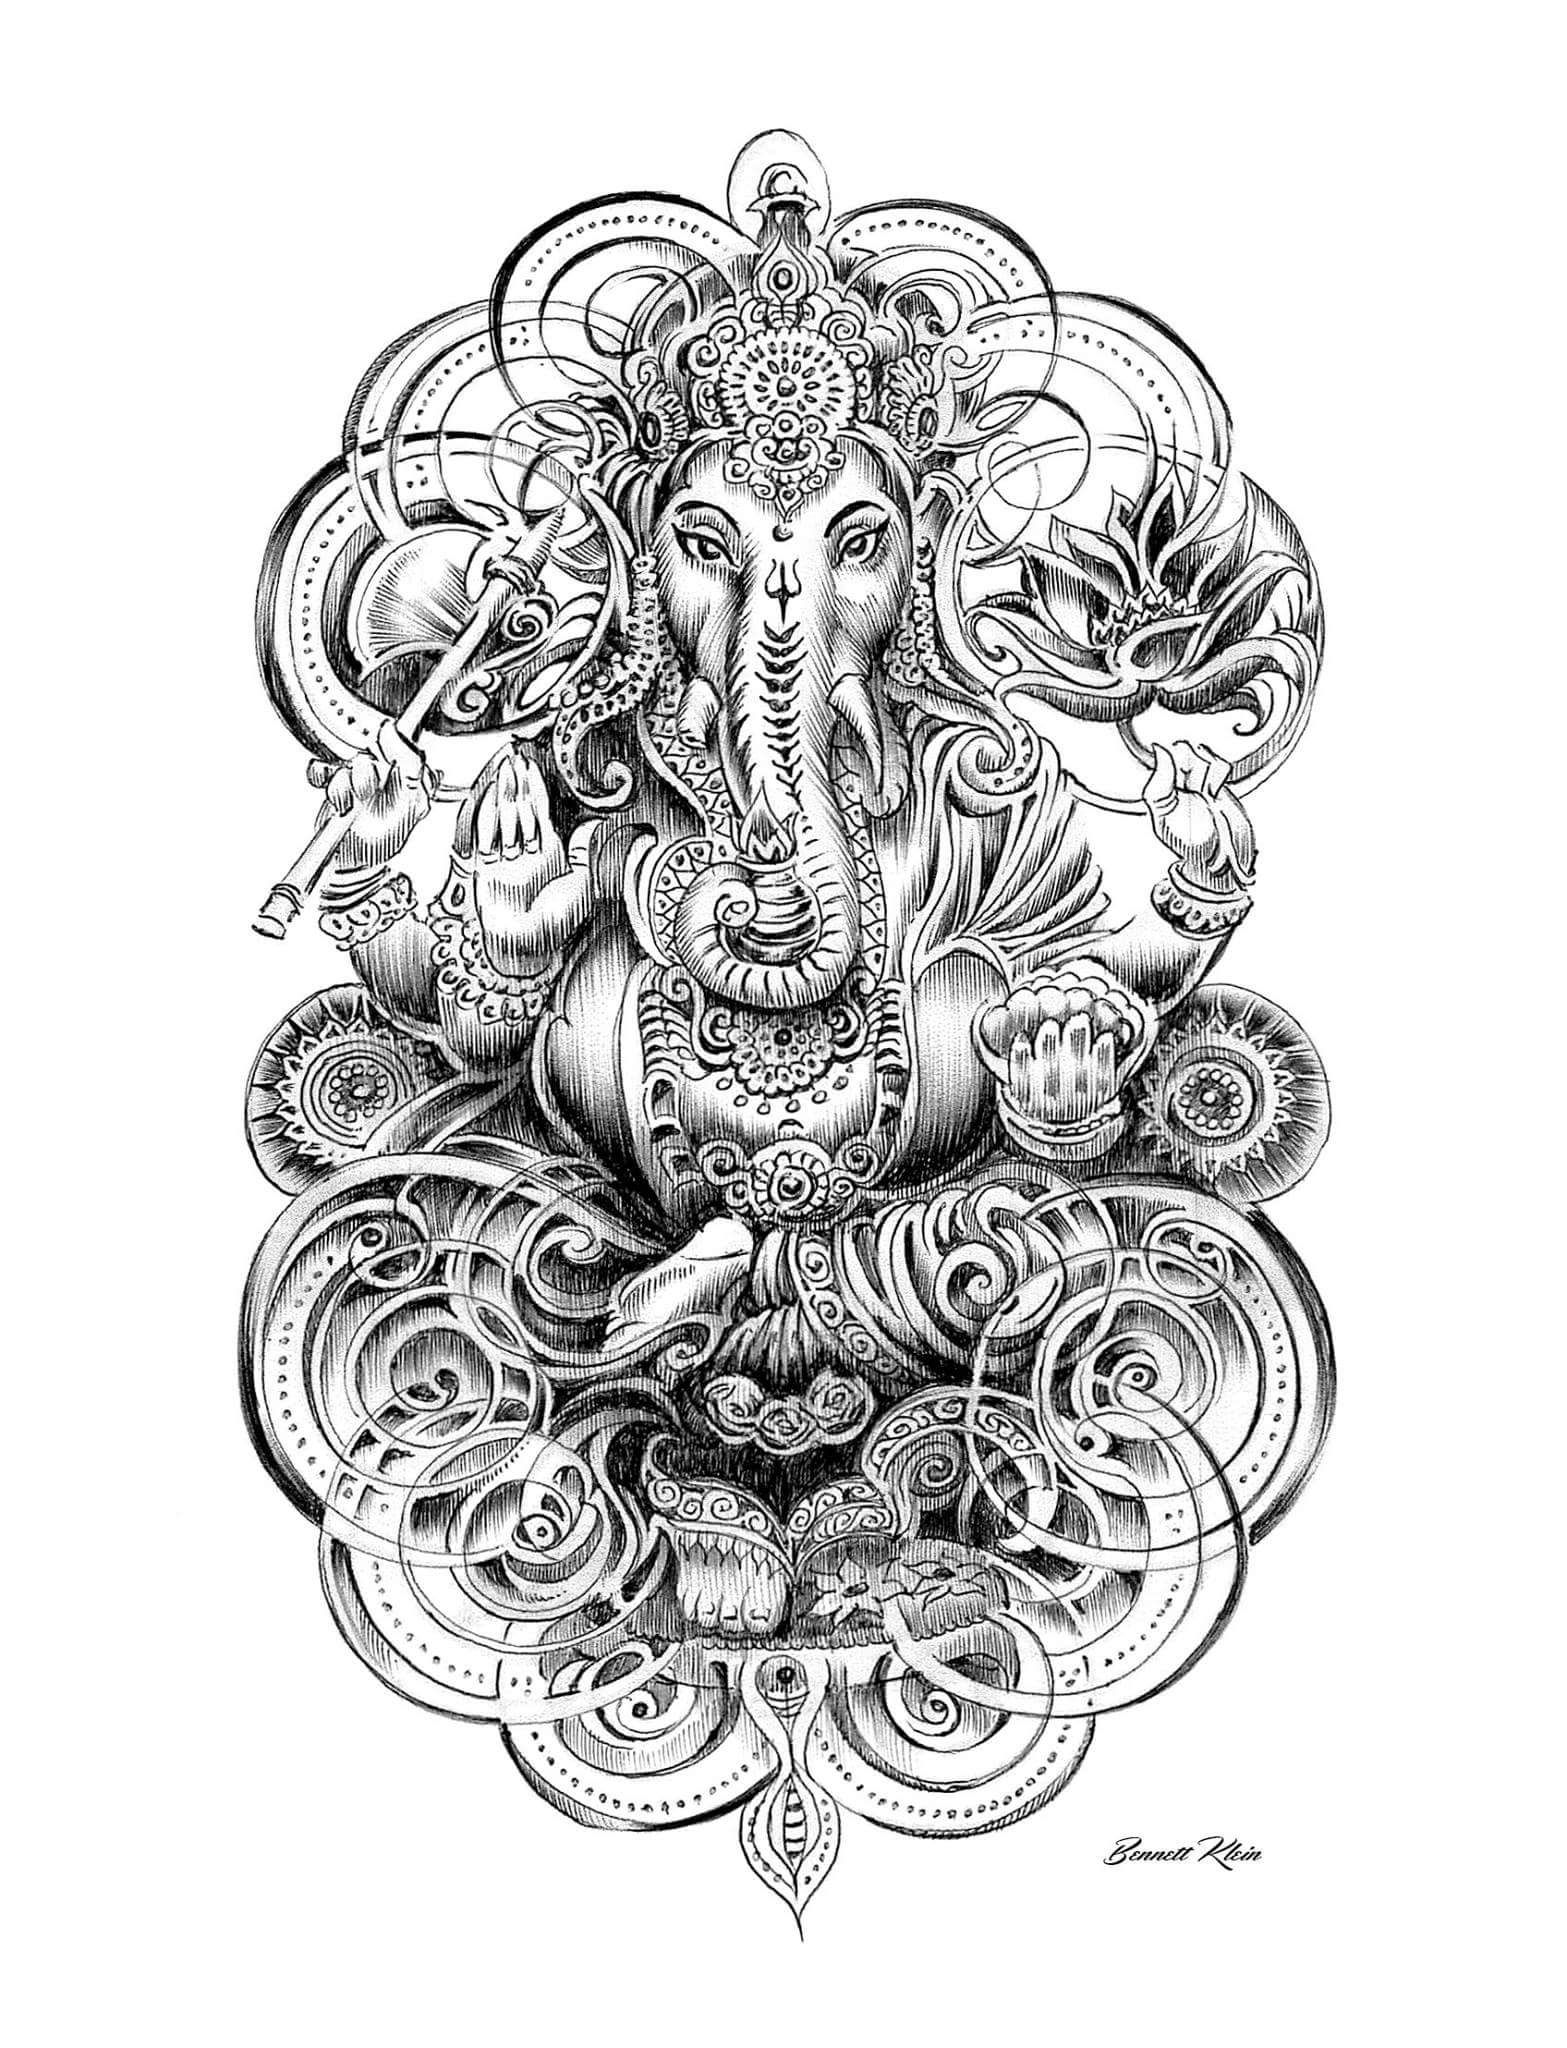 Bennett Klein | tatto | Pinterest | Tatuajes, Ideas de tatuajes y Hindus